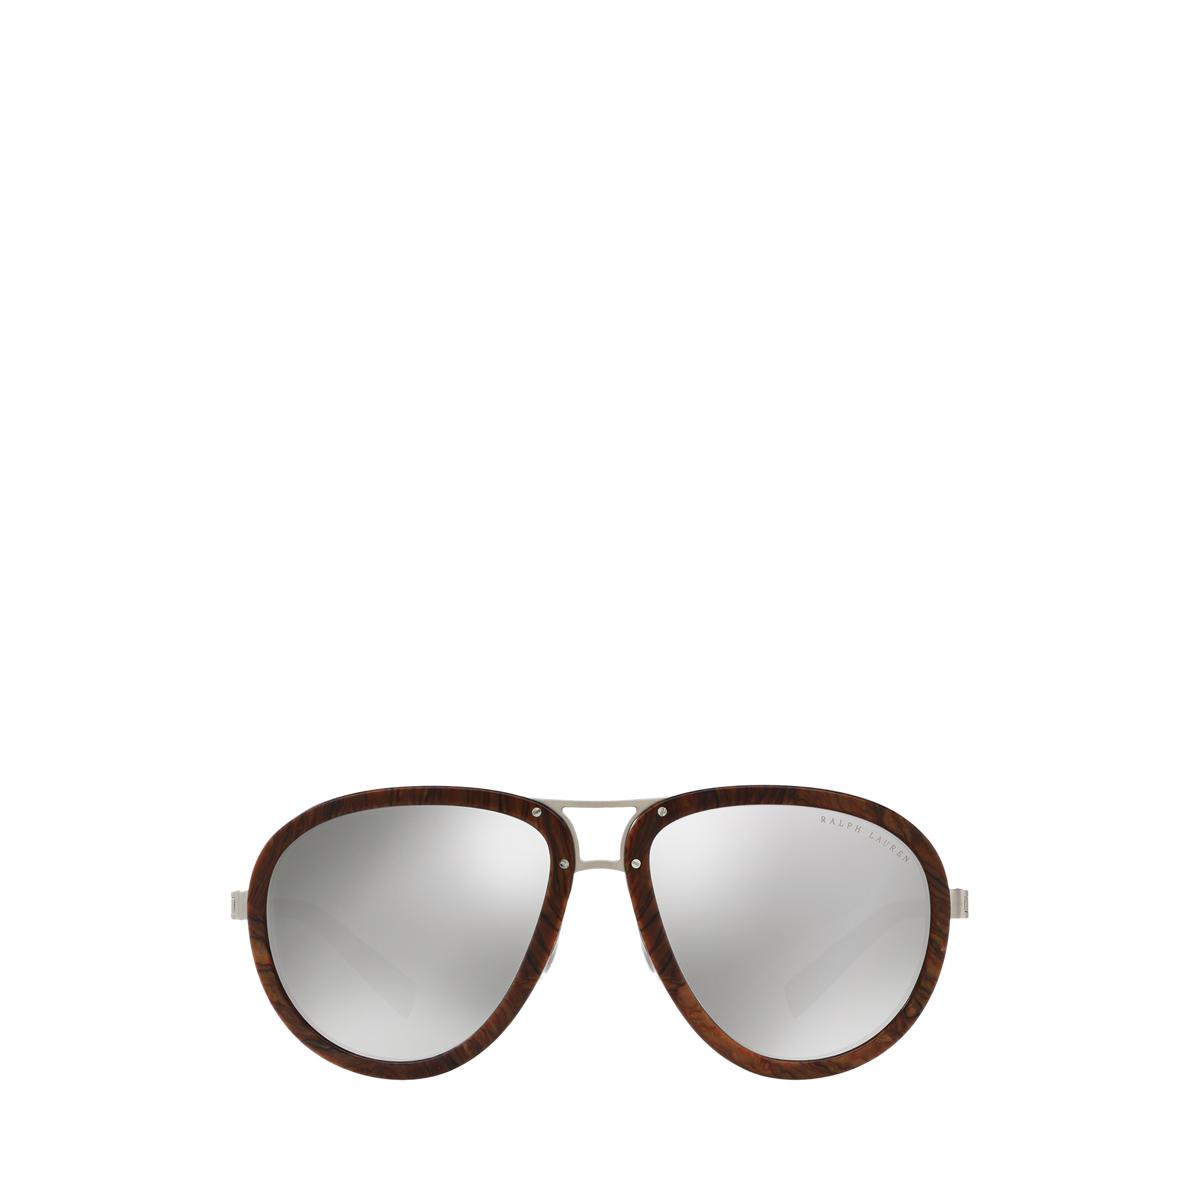 66f42852365f1 Automotive Pilot Sunglasses